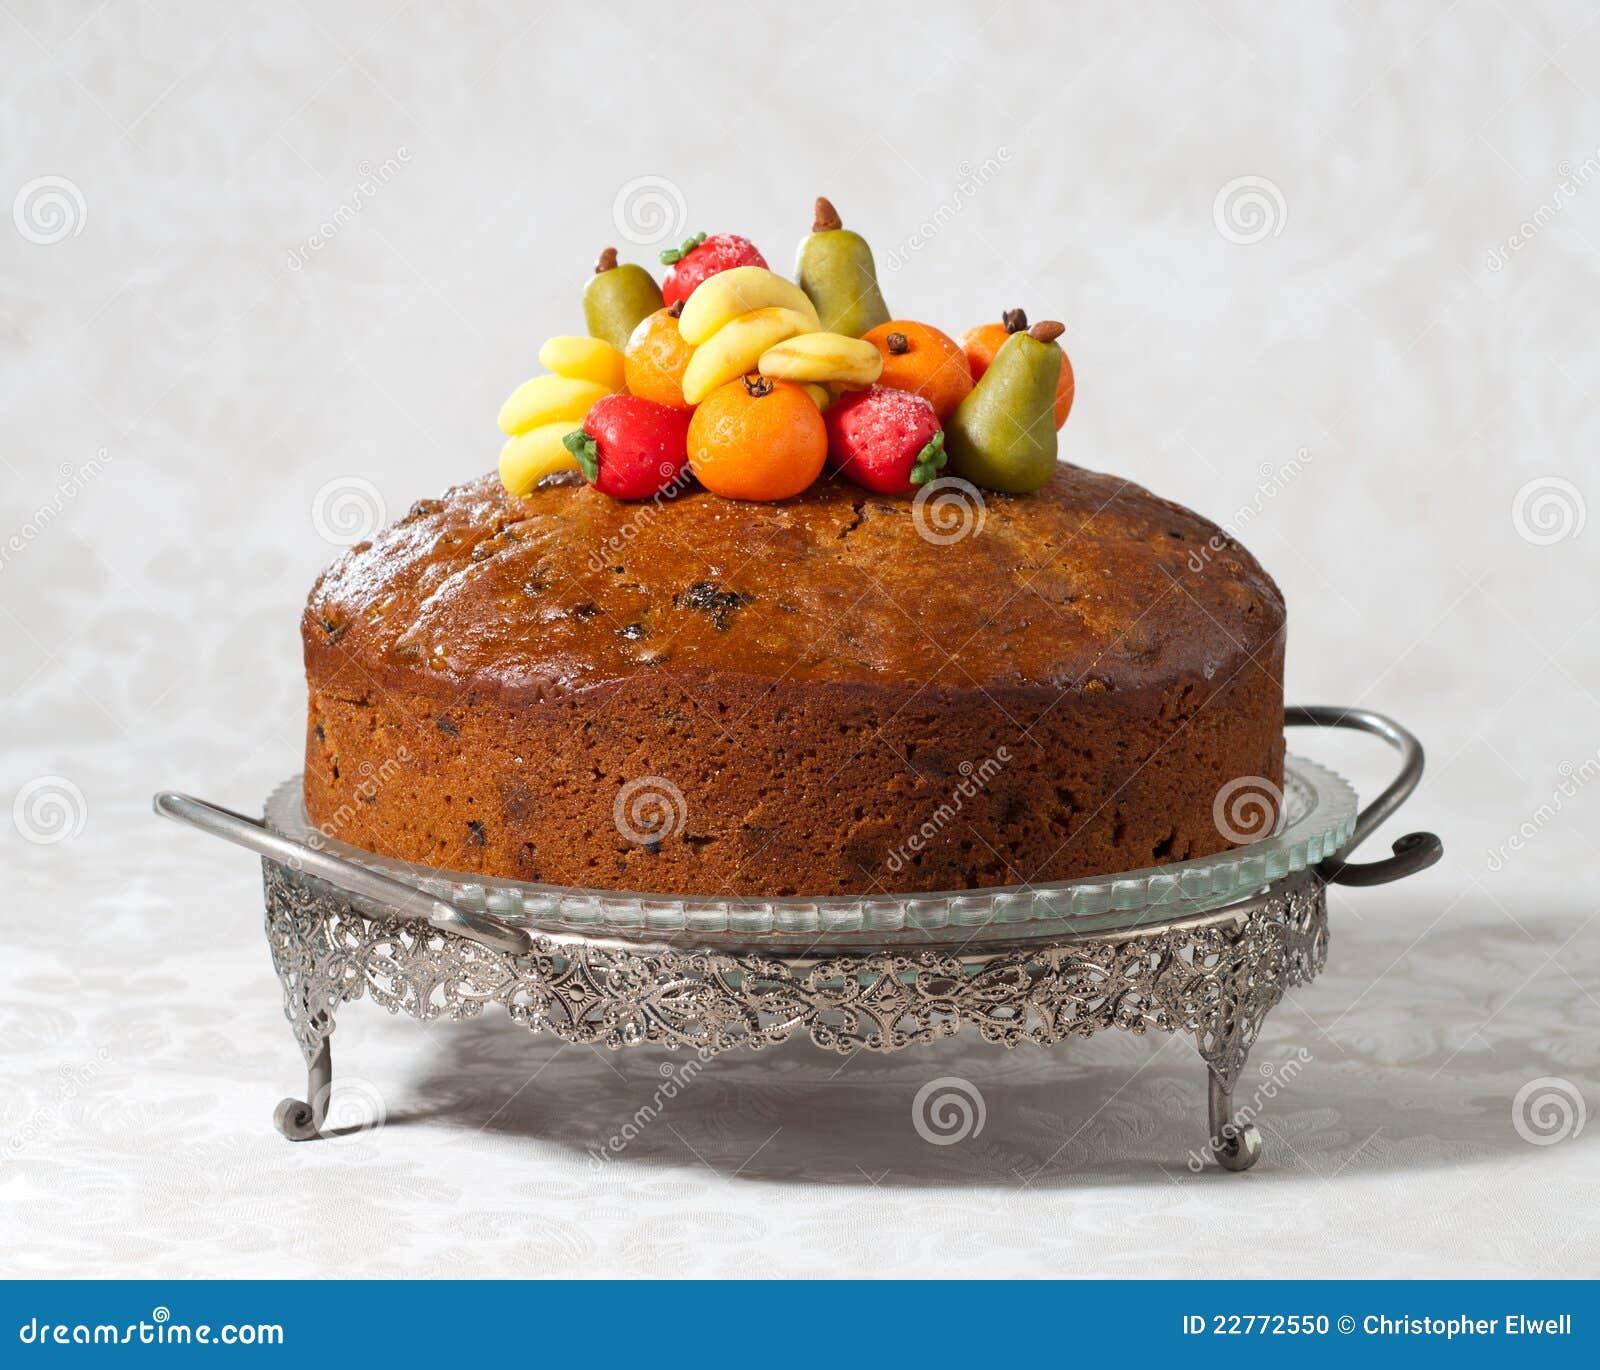 Rich Fruit Birthday Cake Image Inspiration of Cake and Birthday